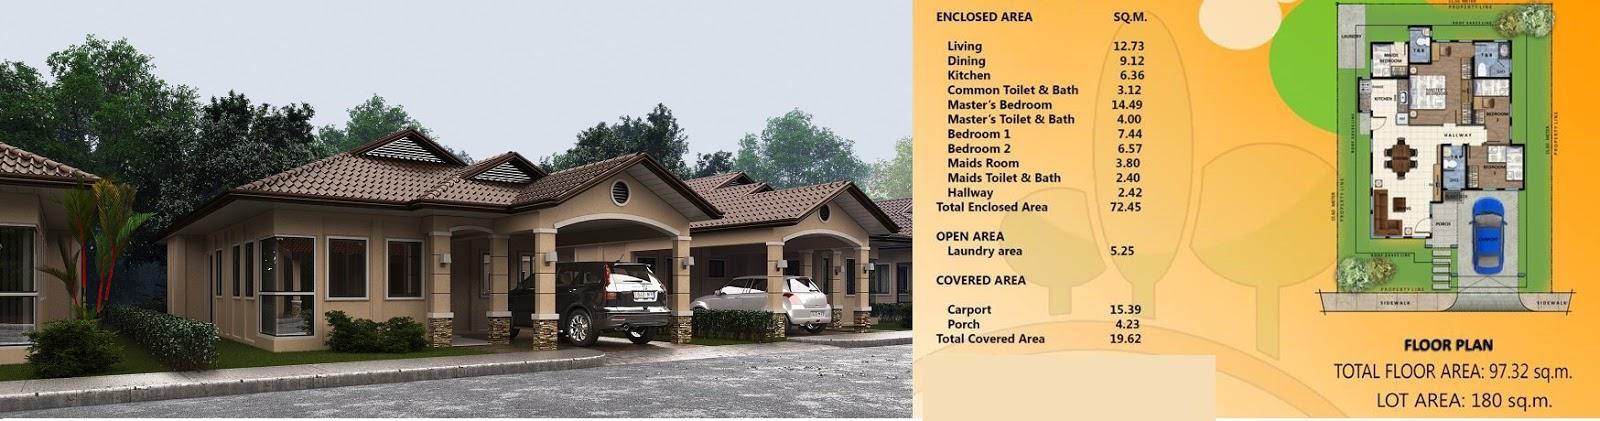 Villa Conchita Chloe House Model Floor Plan